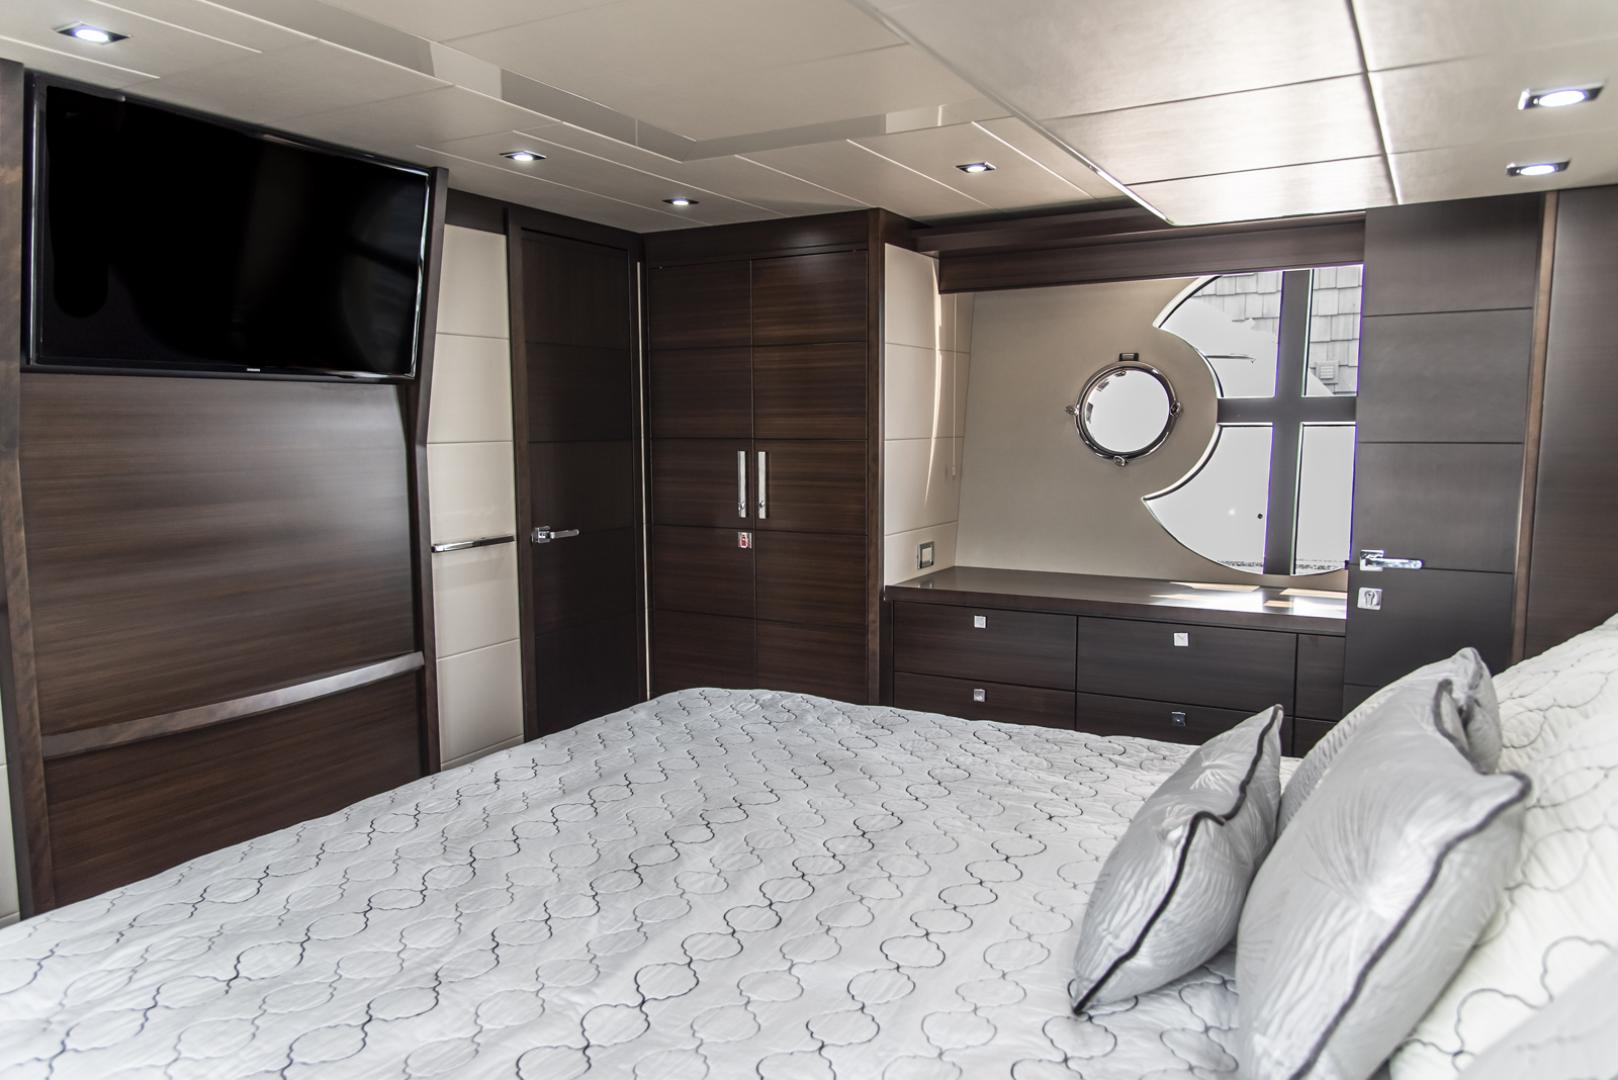 Neptunus-Motor Yacht Express 2018-LIQUID WISDOM Grand Haven-Michigan-United States-Master looking forward to stbd-1484982 | Thumbnail